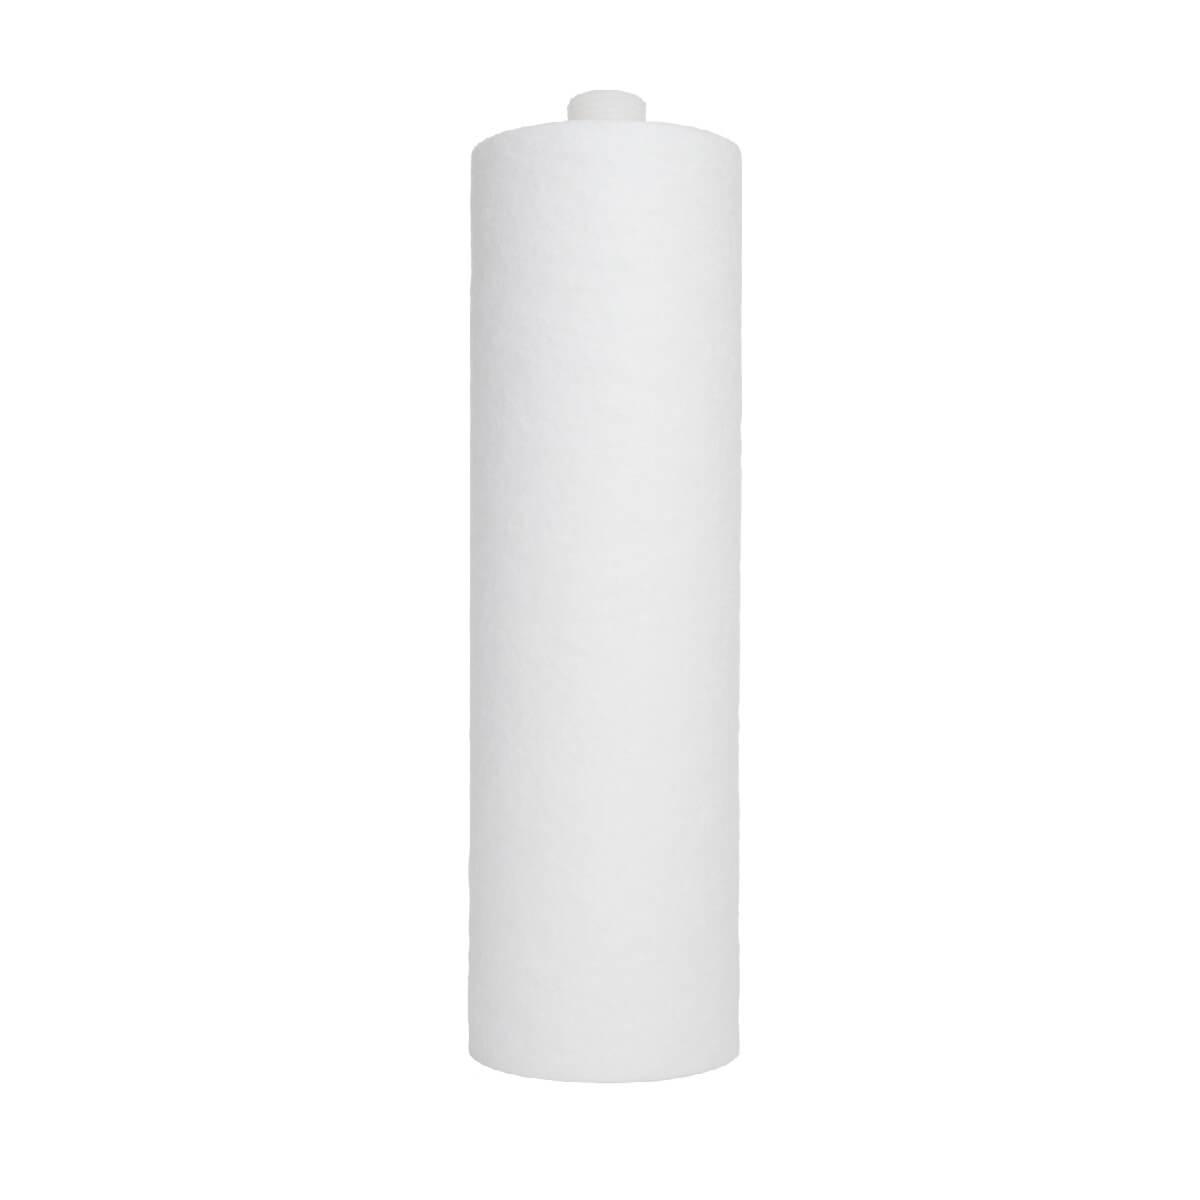 "Refil de Polipropileno para filtros de 10"" com rosca Ravena WP 230P"